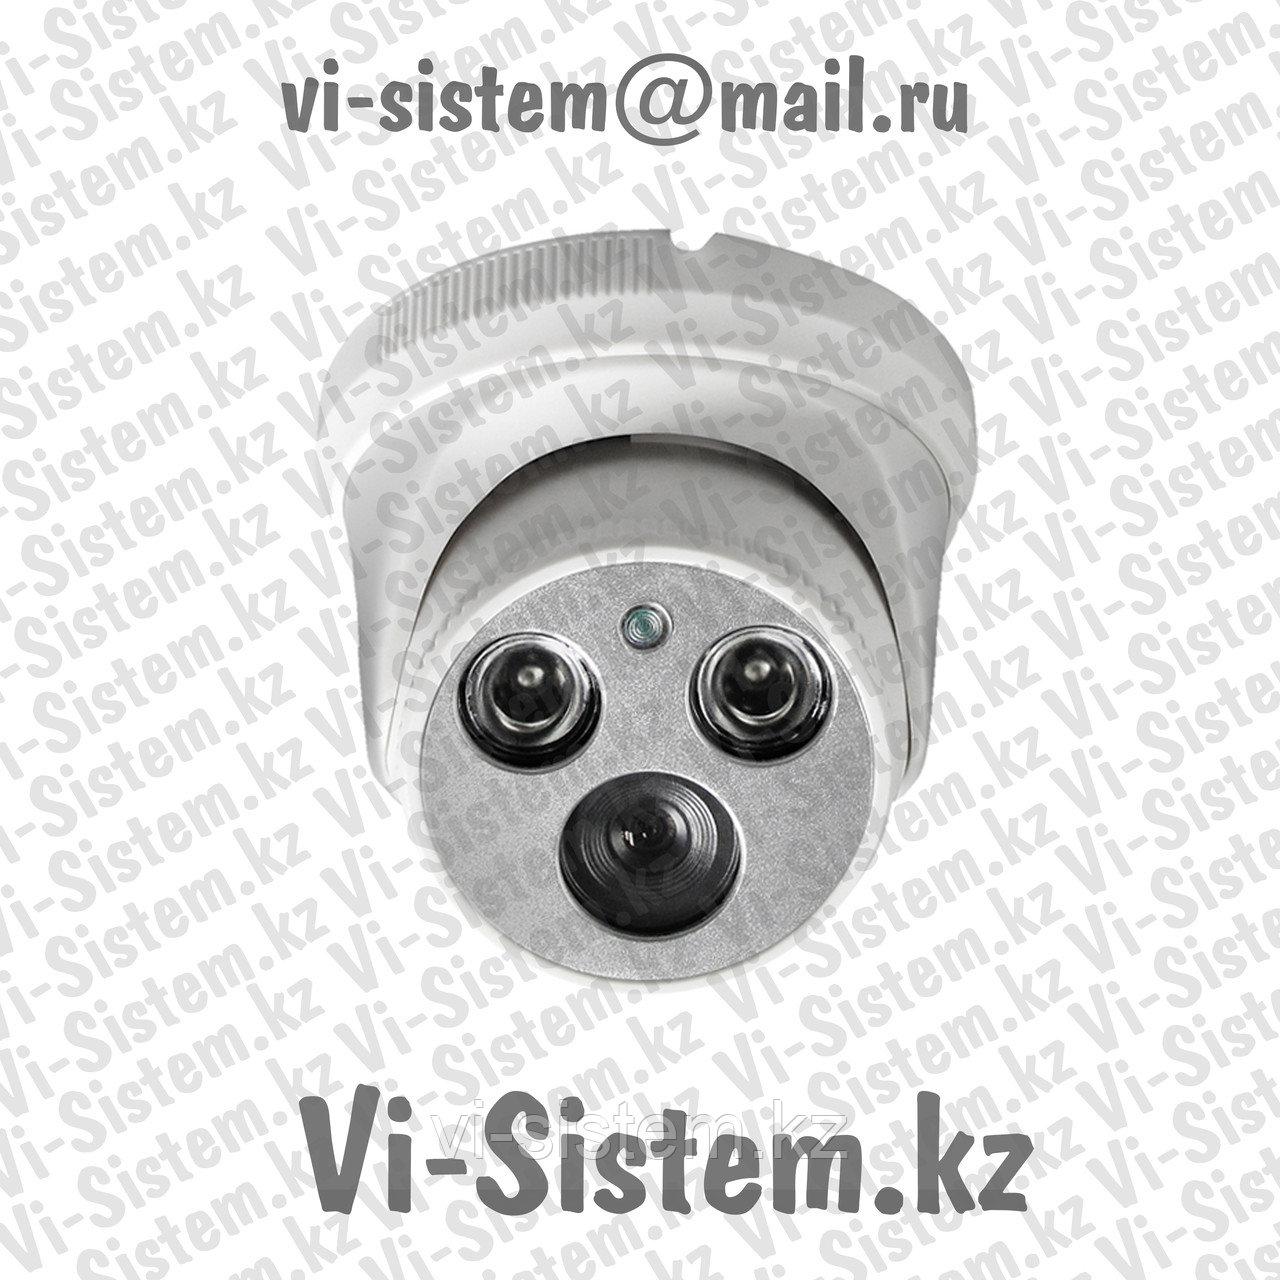 AHD-Видеокамера SYNQAR SY-814 2MP